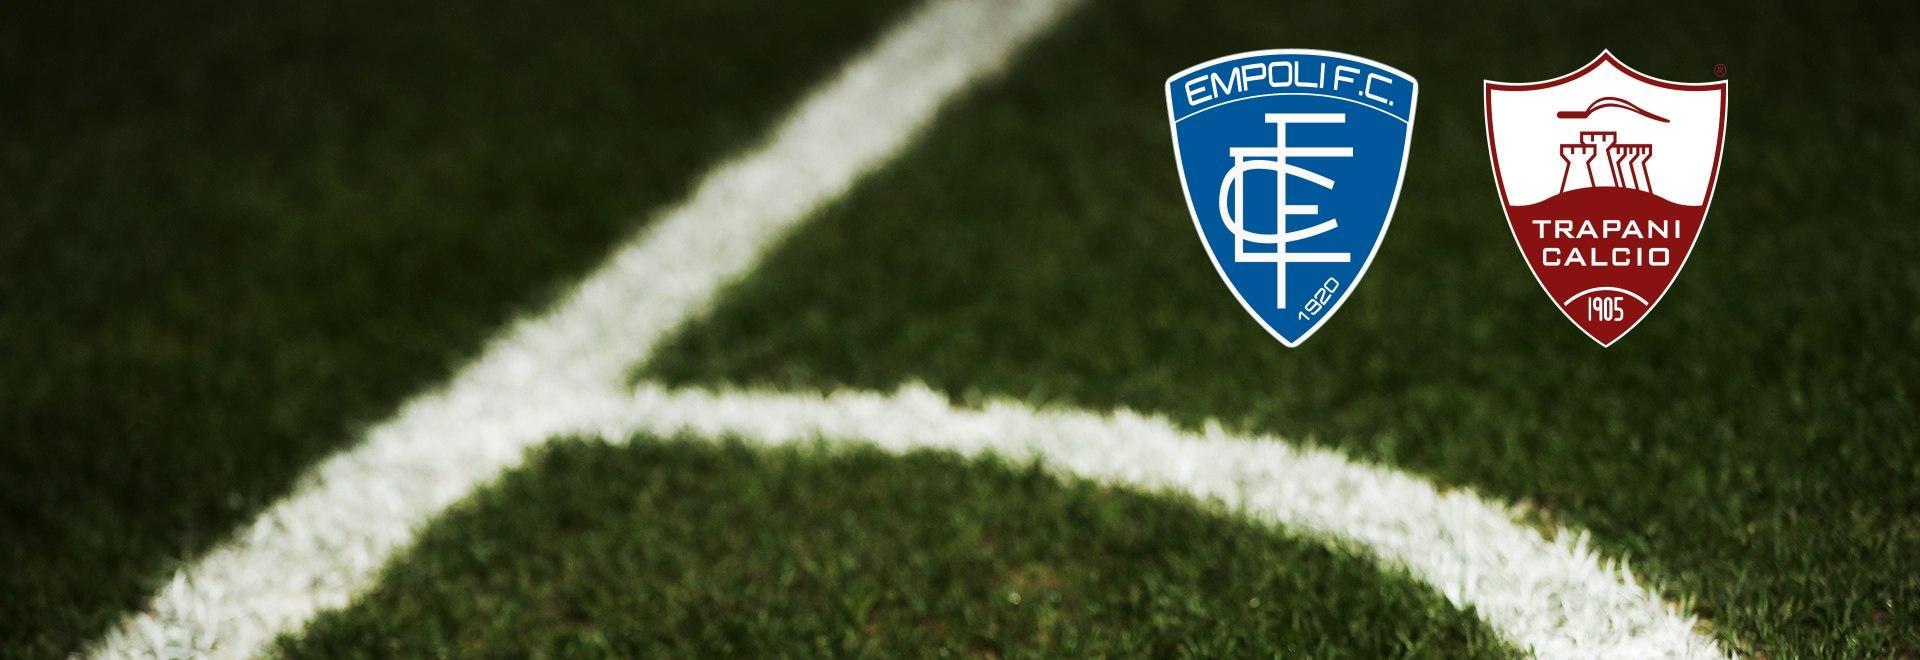 Empoli - Trapani. 28a g.